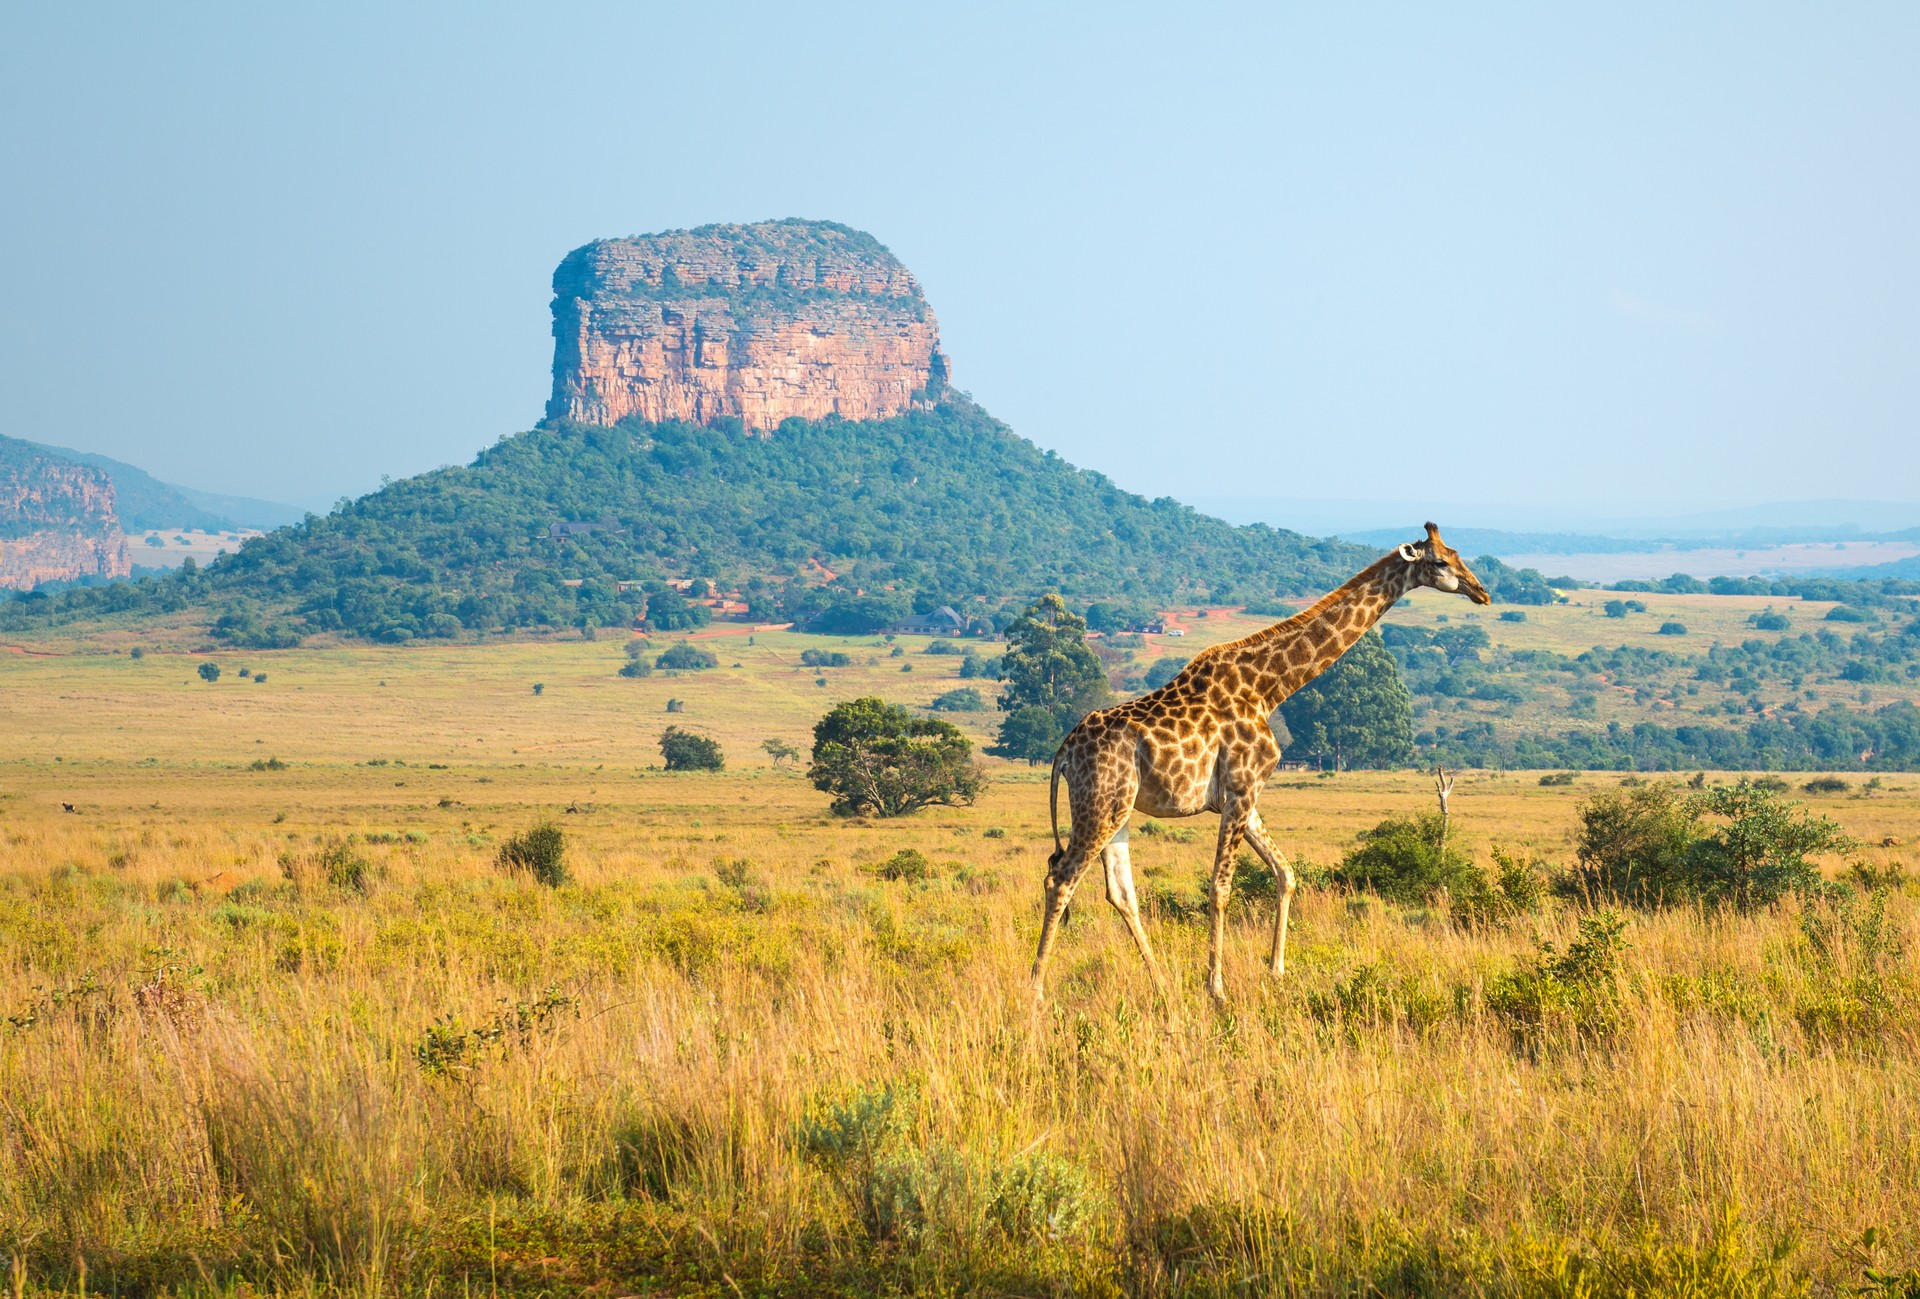 A giraffe walks across the Entabeni Safari Reserve in Limpopo province